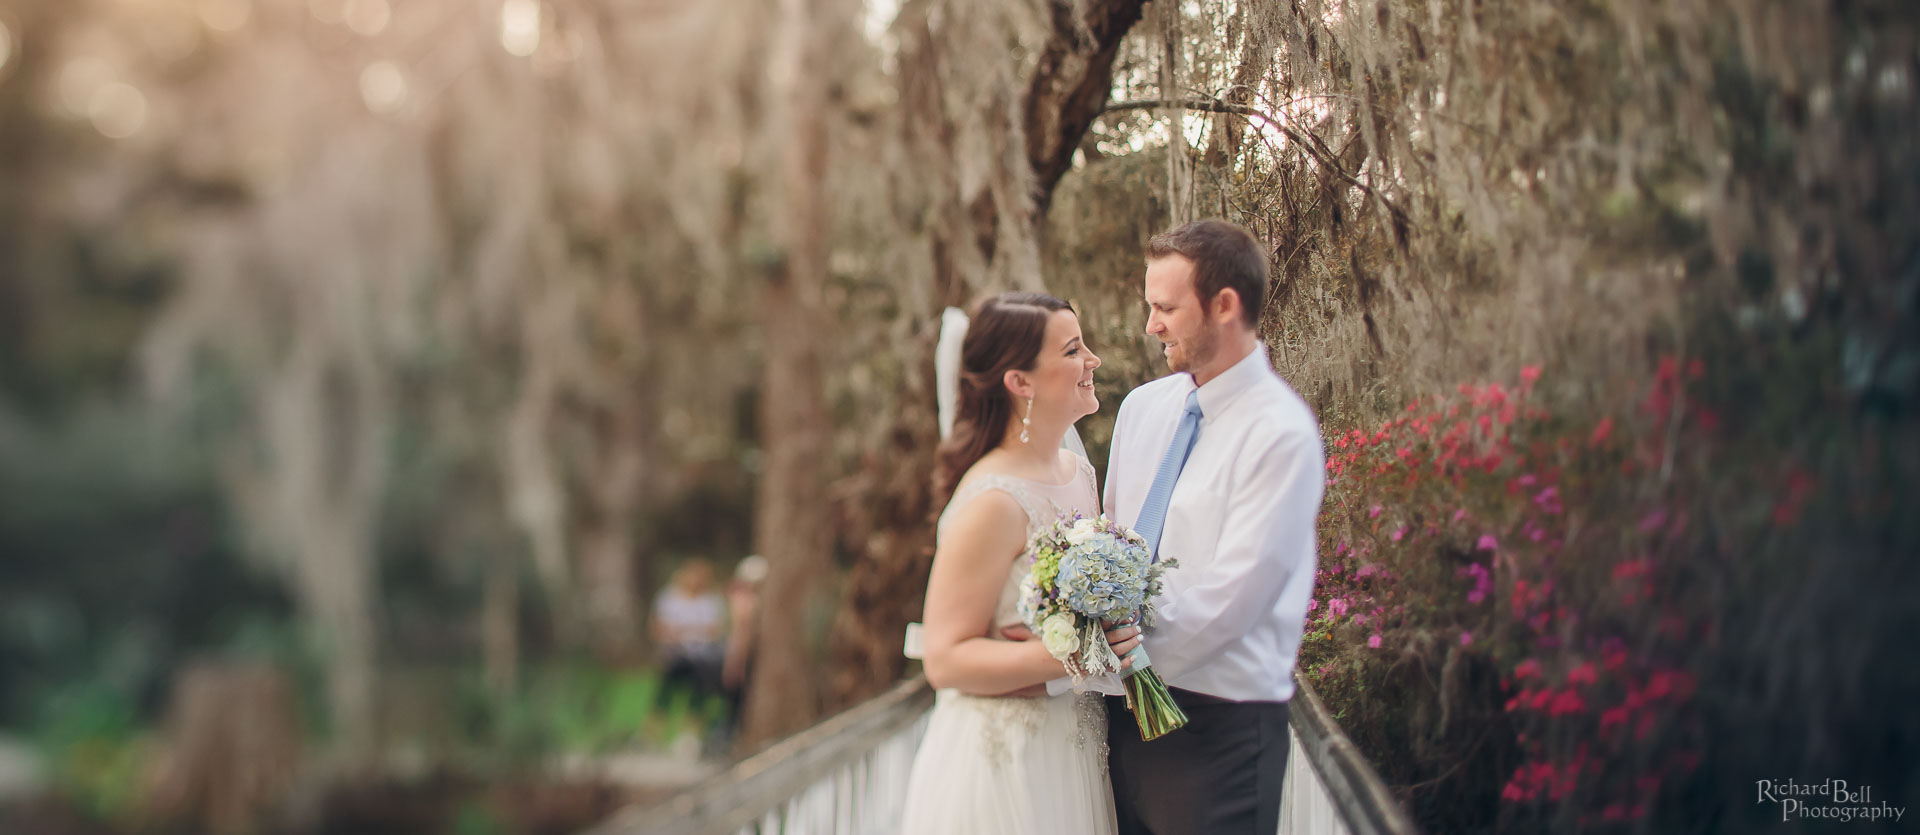 Katherine and John on the White Bridge